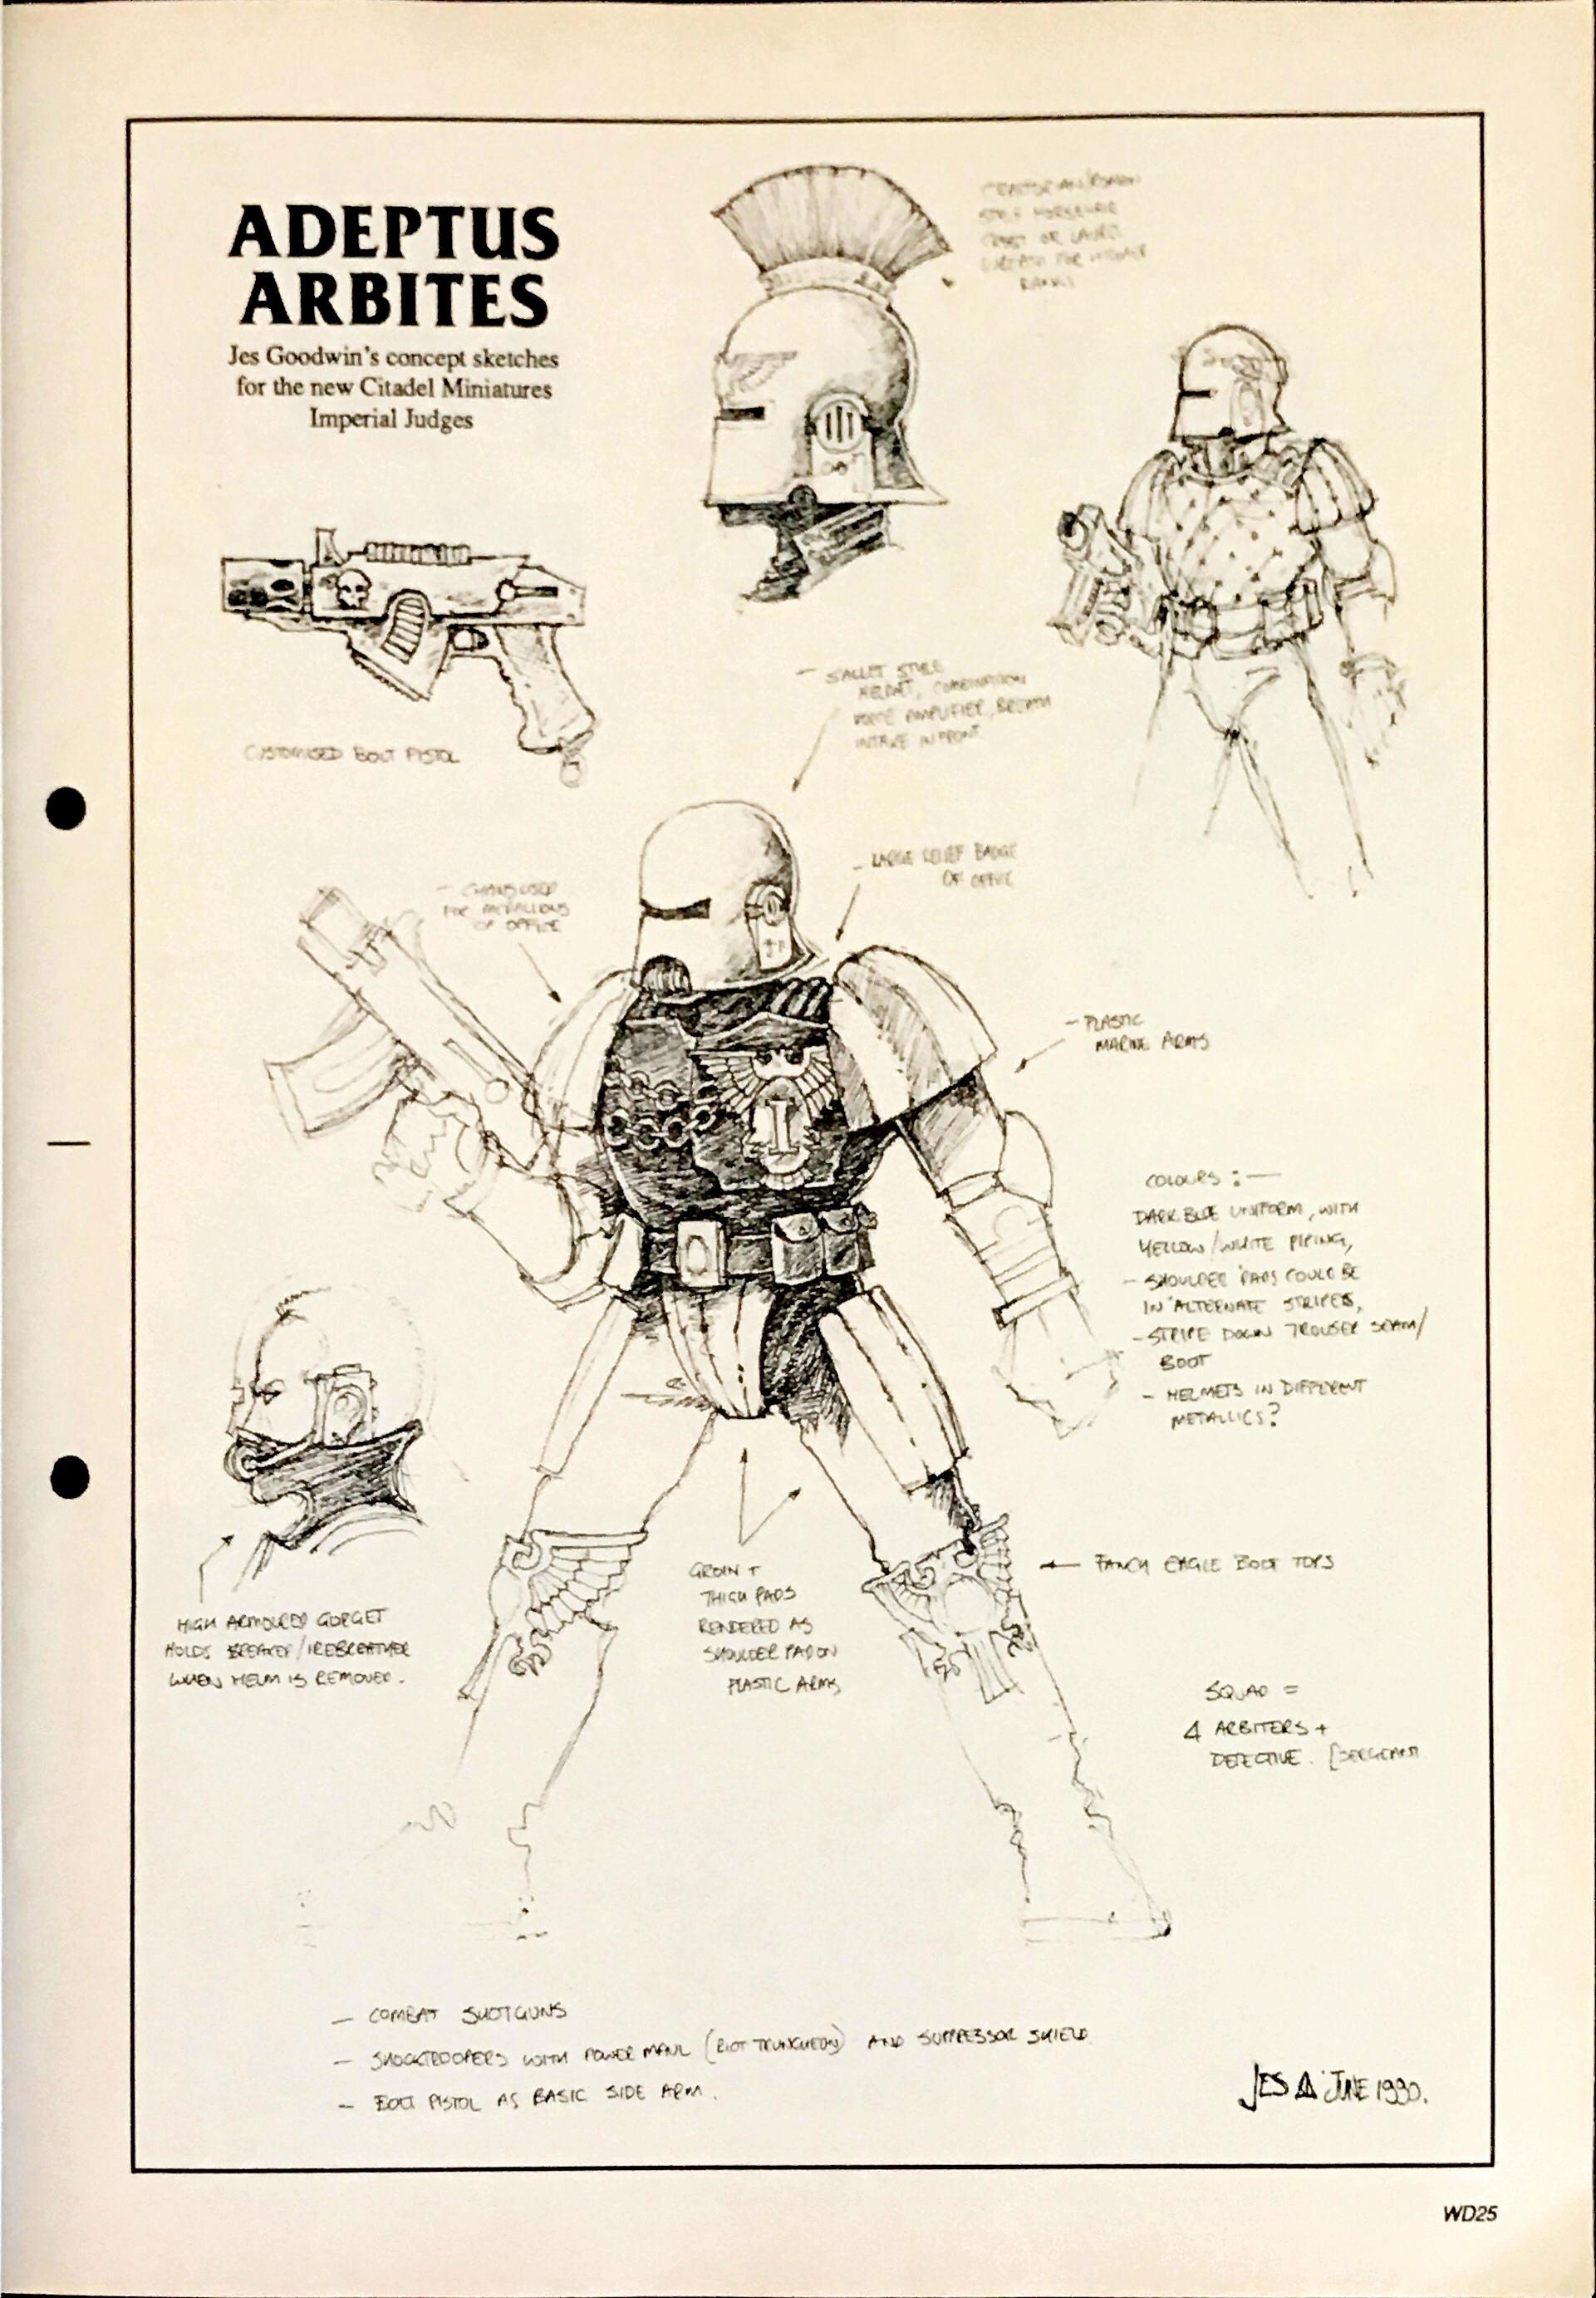 Confrontation, Copyright Games Workshop, Jes Goodwin, Necromunda, Retro Review, Warhammer 40,000, White Dwarf